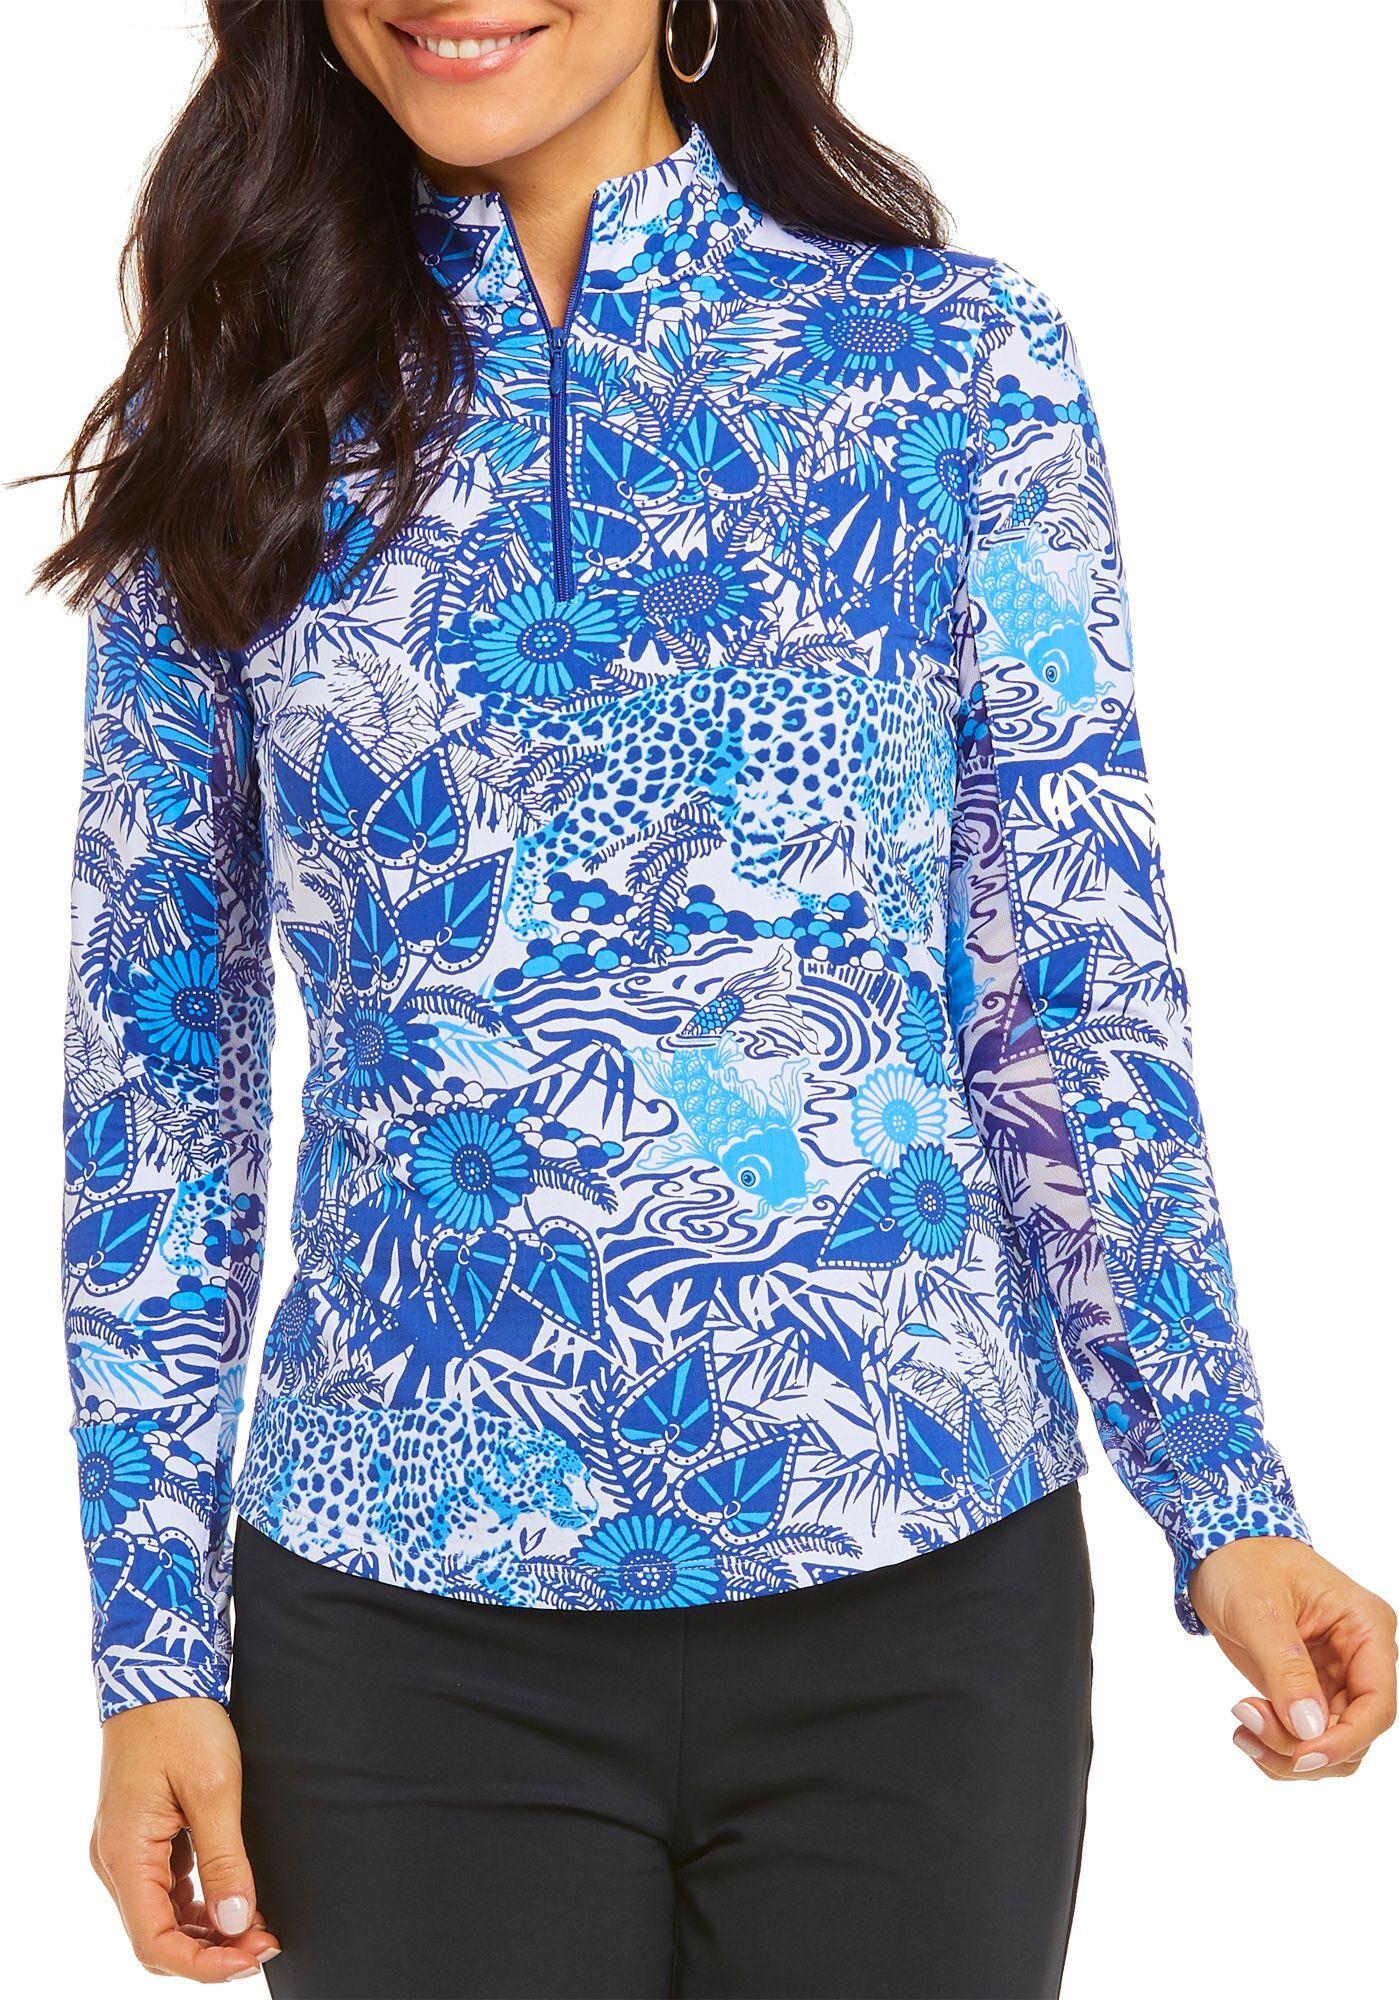 IBKUL Women's Hearts Mock Neck Long Sleeve Shirt, XL, Bamboo Garden Blue Tonal